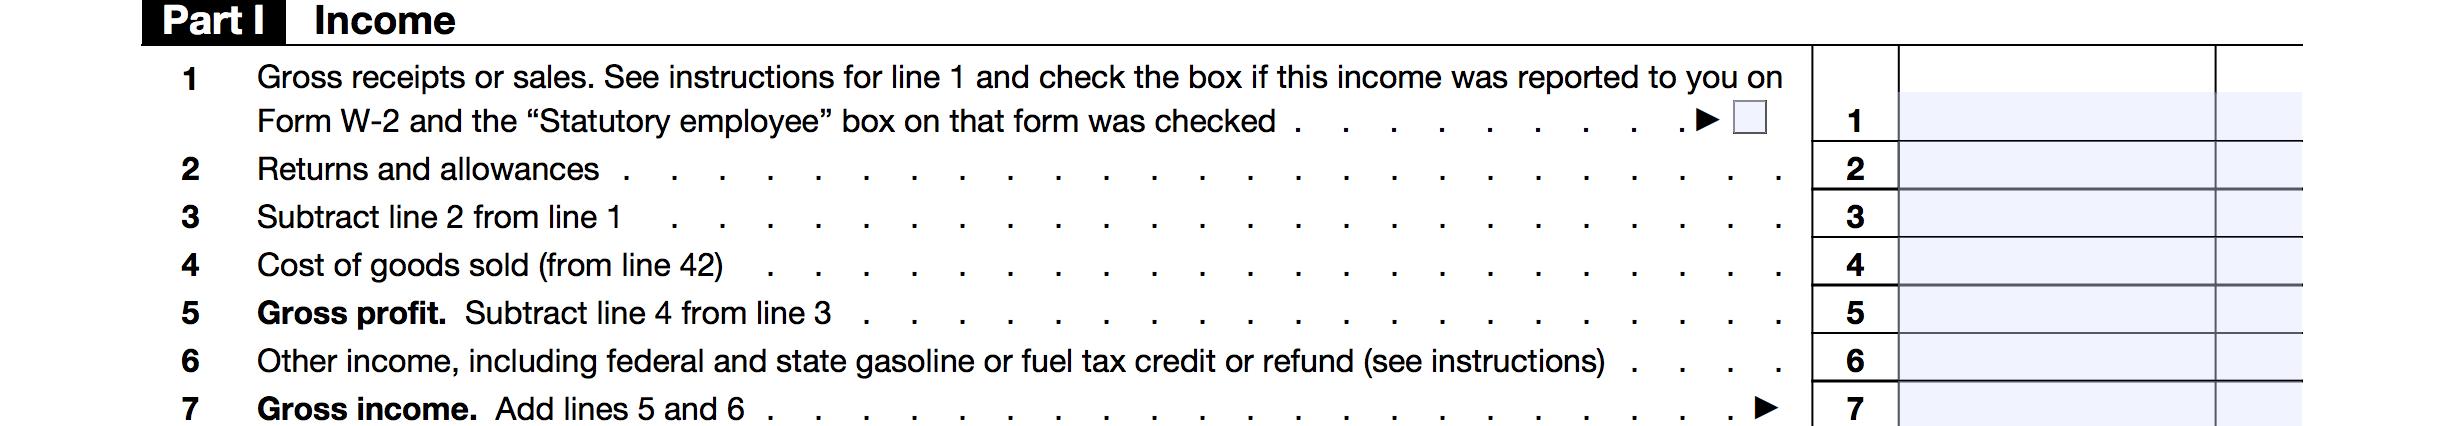 Schedule C Part 1: Gross Income